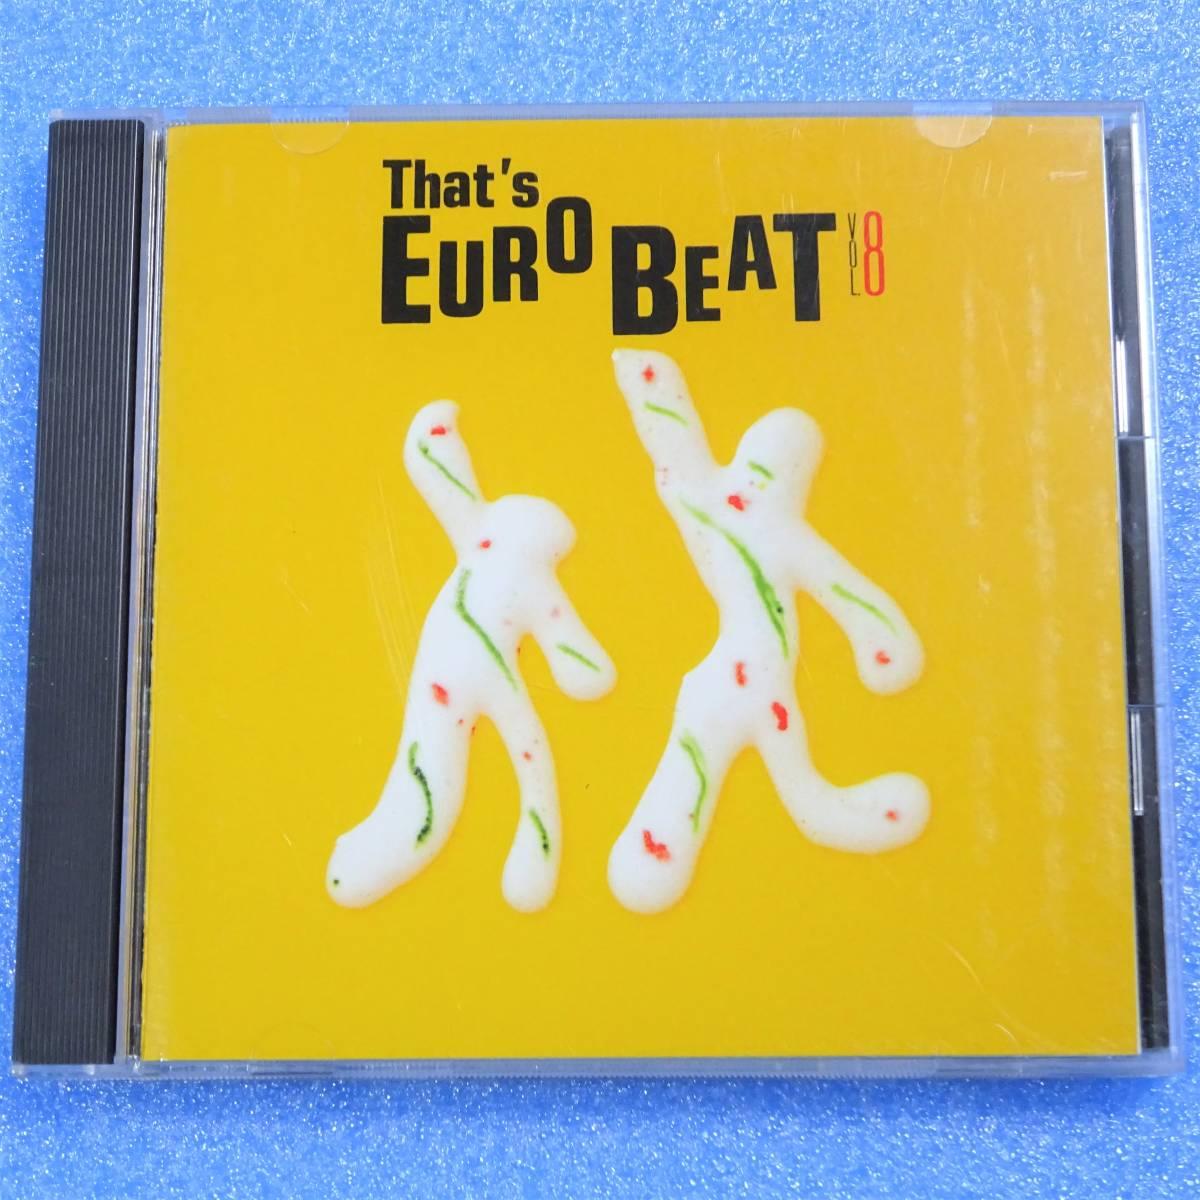 CD ザッツ・ユーロビート THAT'S EUROBEAT Vol.8 1988年 ディスコ ユーロビート マイケル・フォーチュナティ_画像2